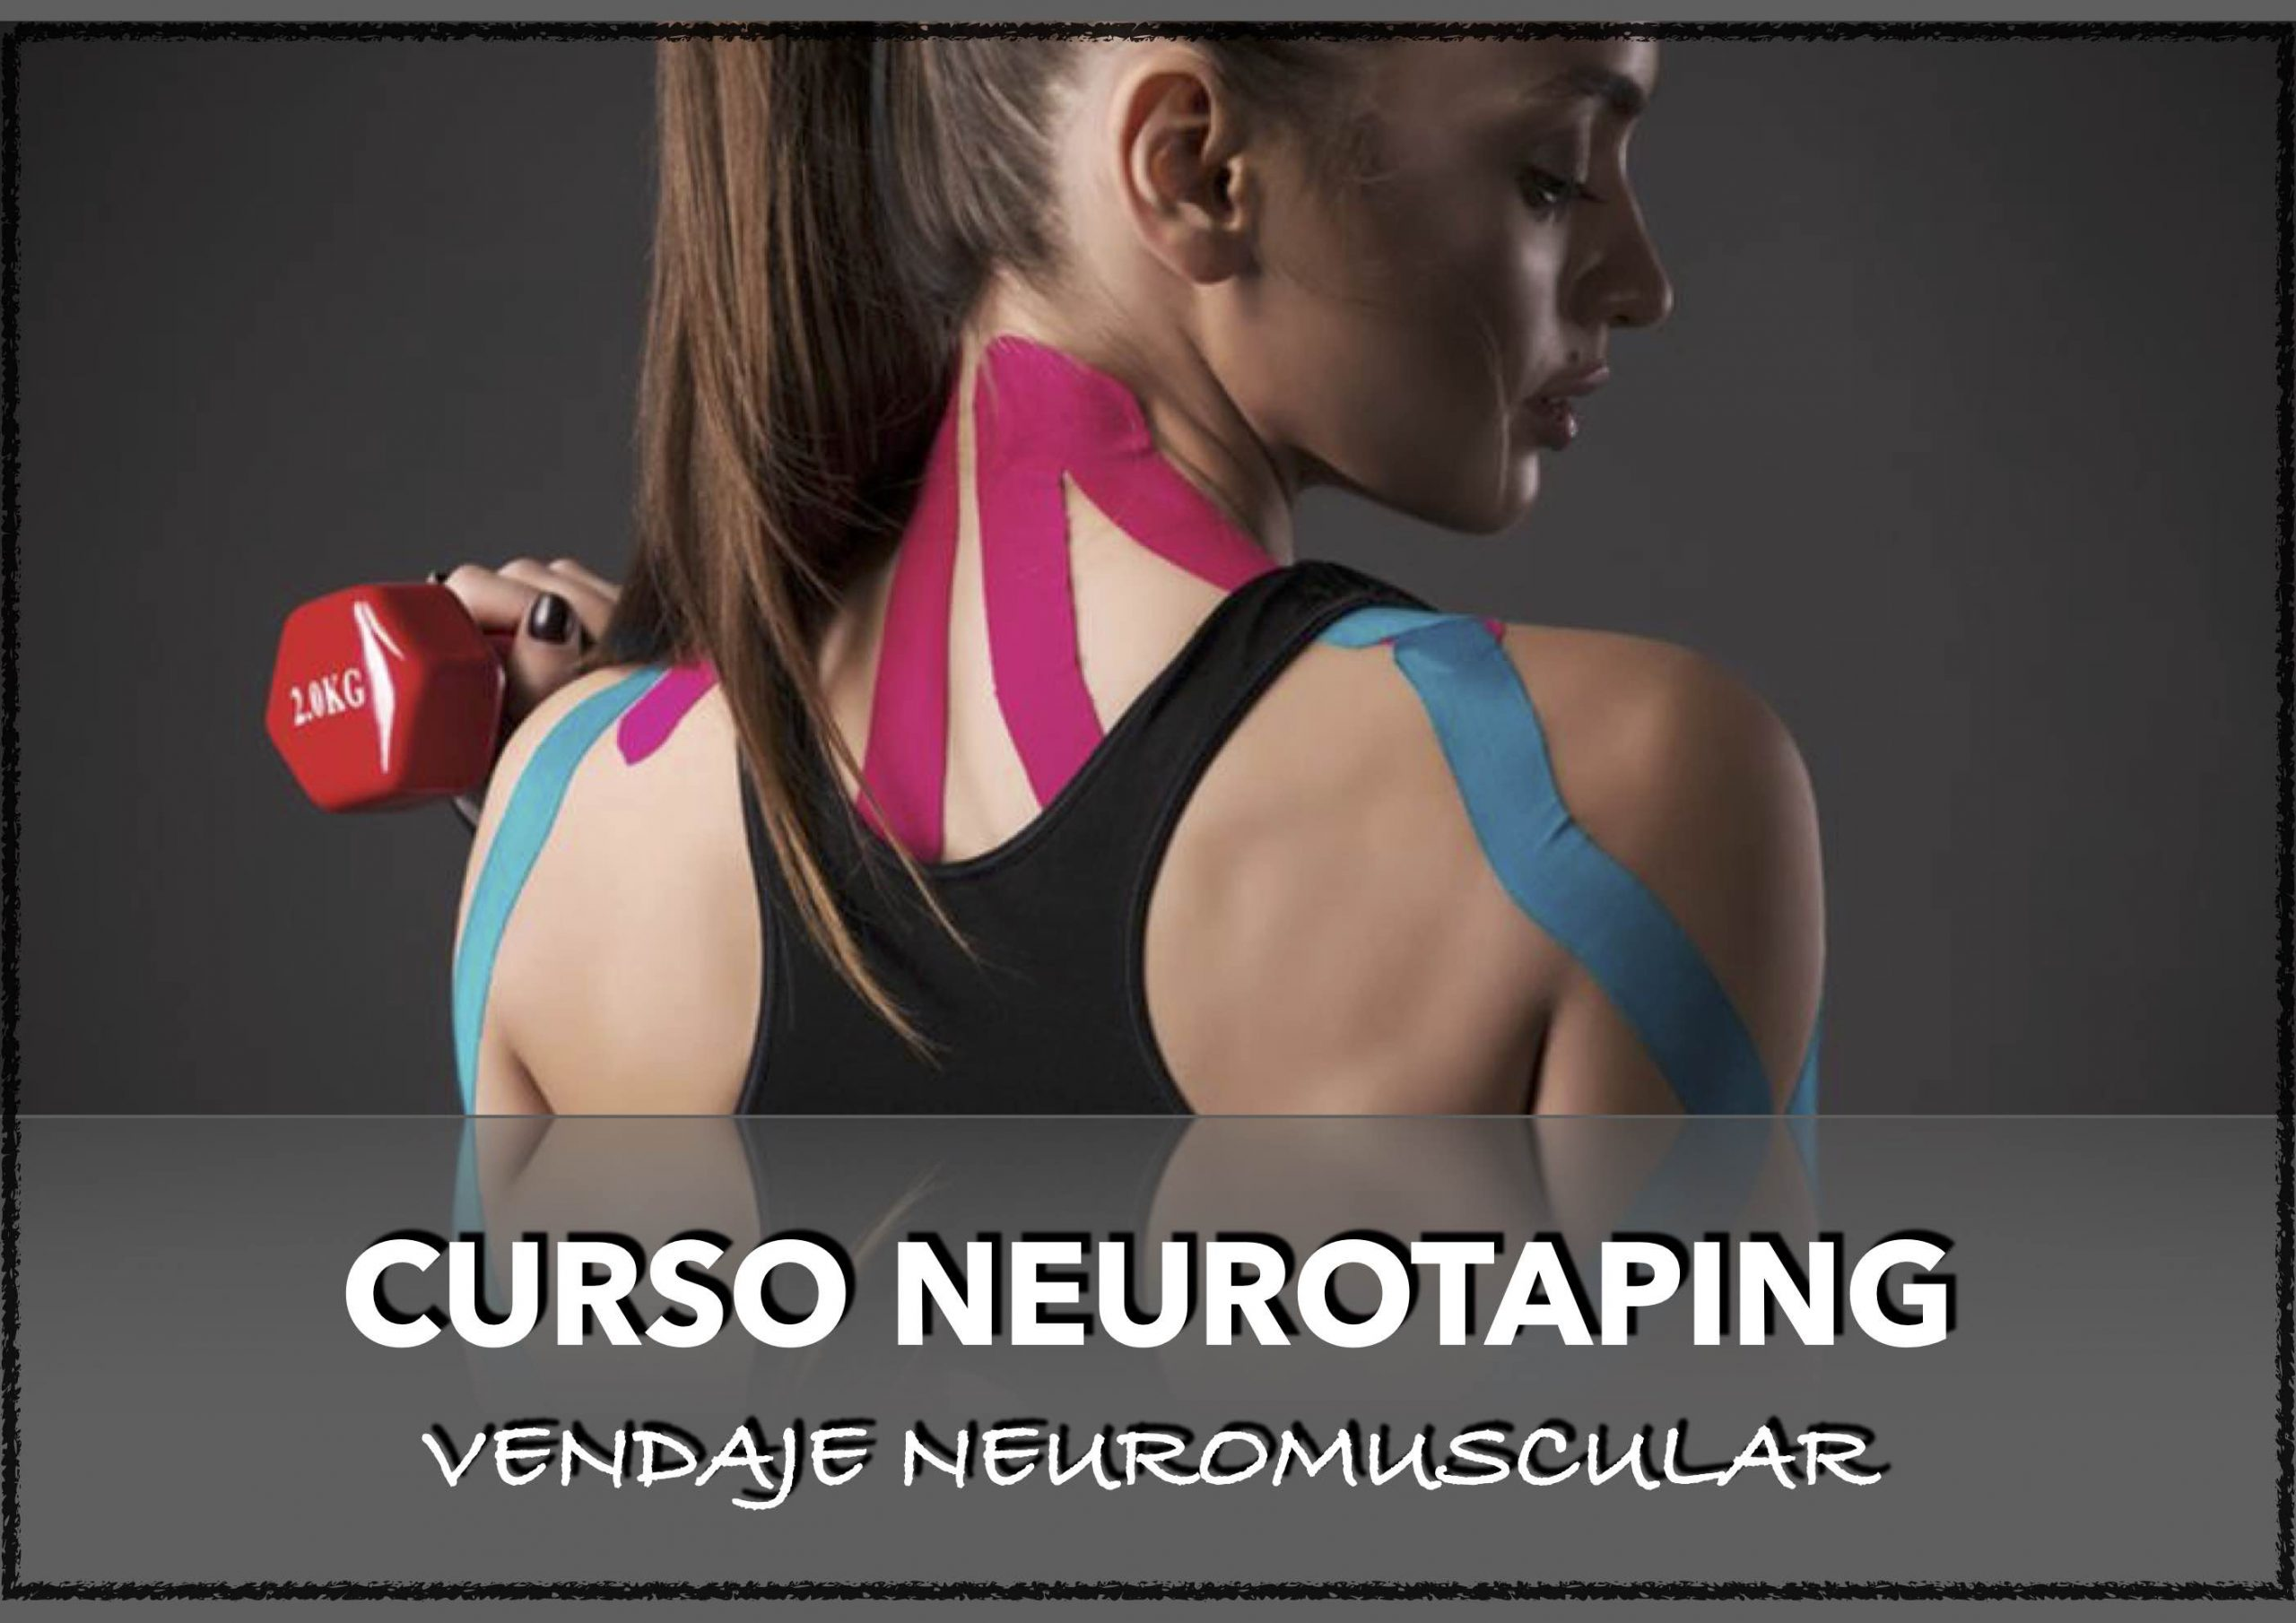 CURSO DE NEUROTAPING - VENDAJE NEUROMUSCULAR  CHICLANA CADIZ IBIZA HUELVA SEVILLA